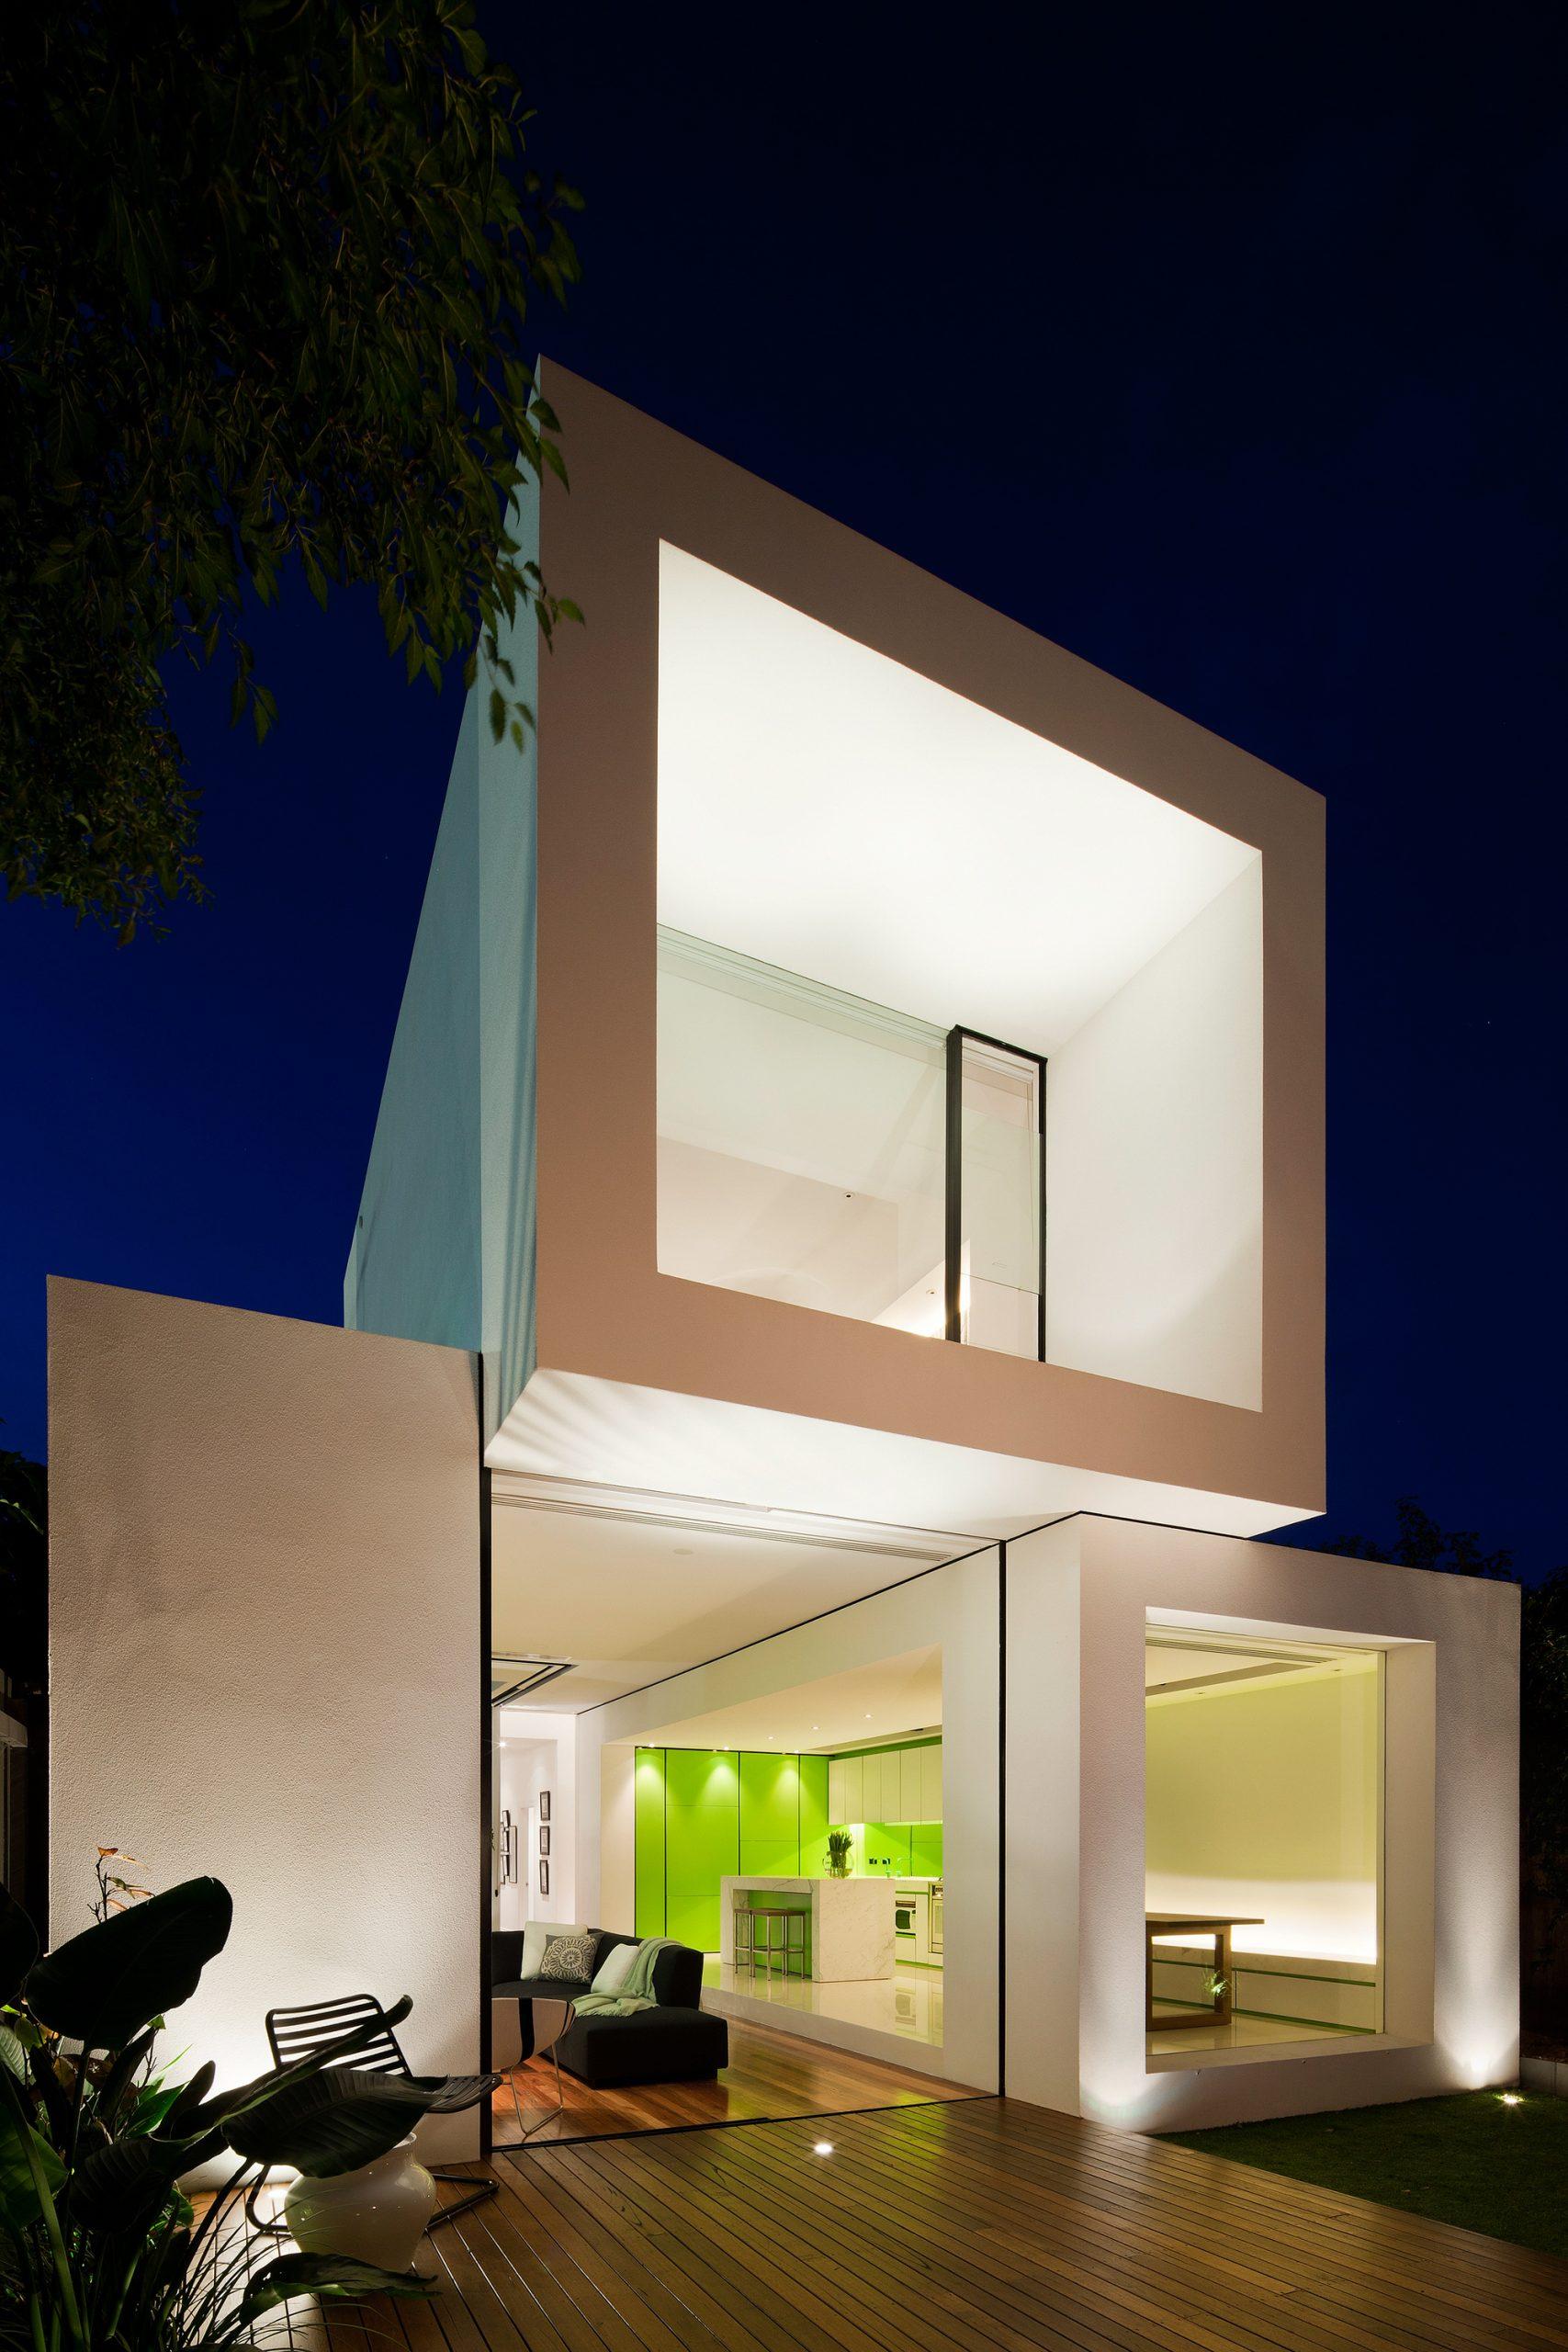 Shakin Stevens Green Space House – Melbourne, Victoria, Australia